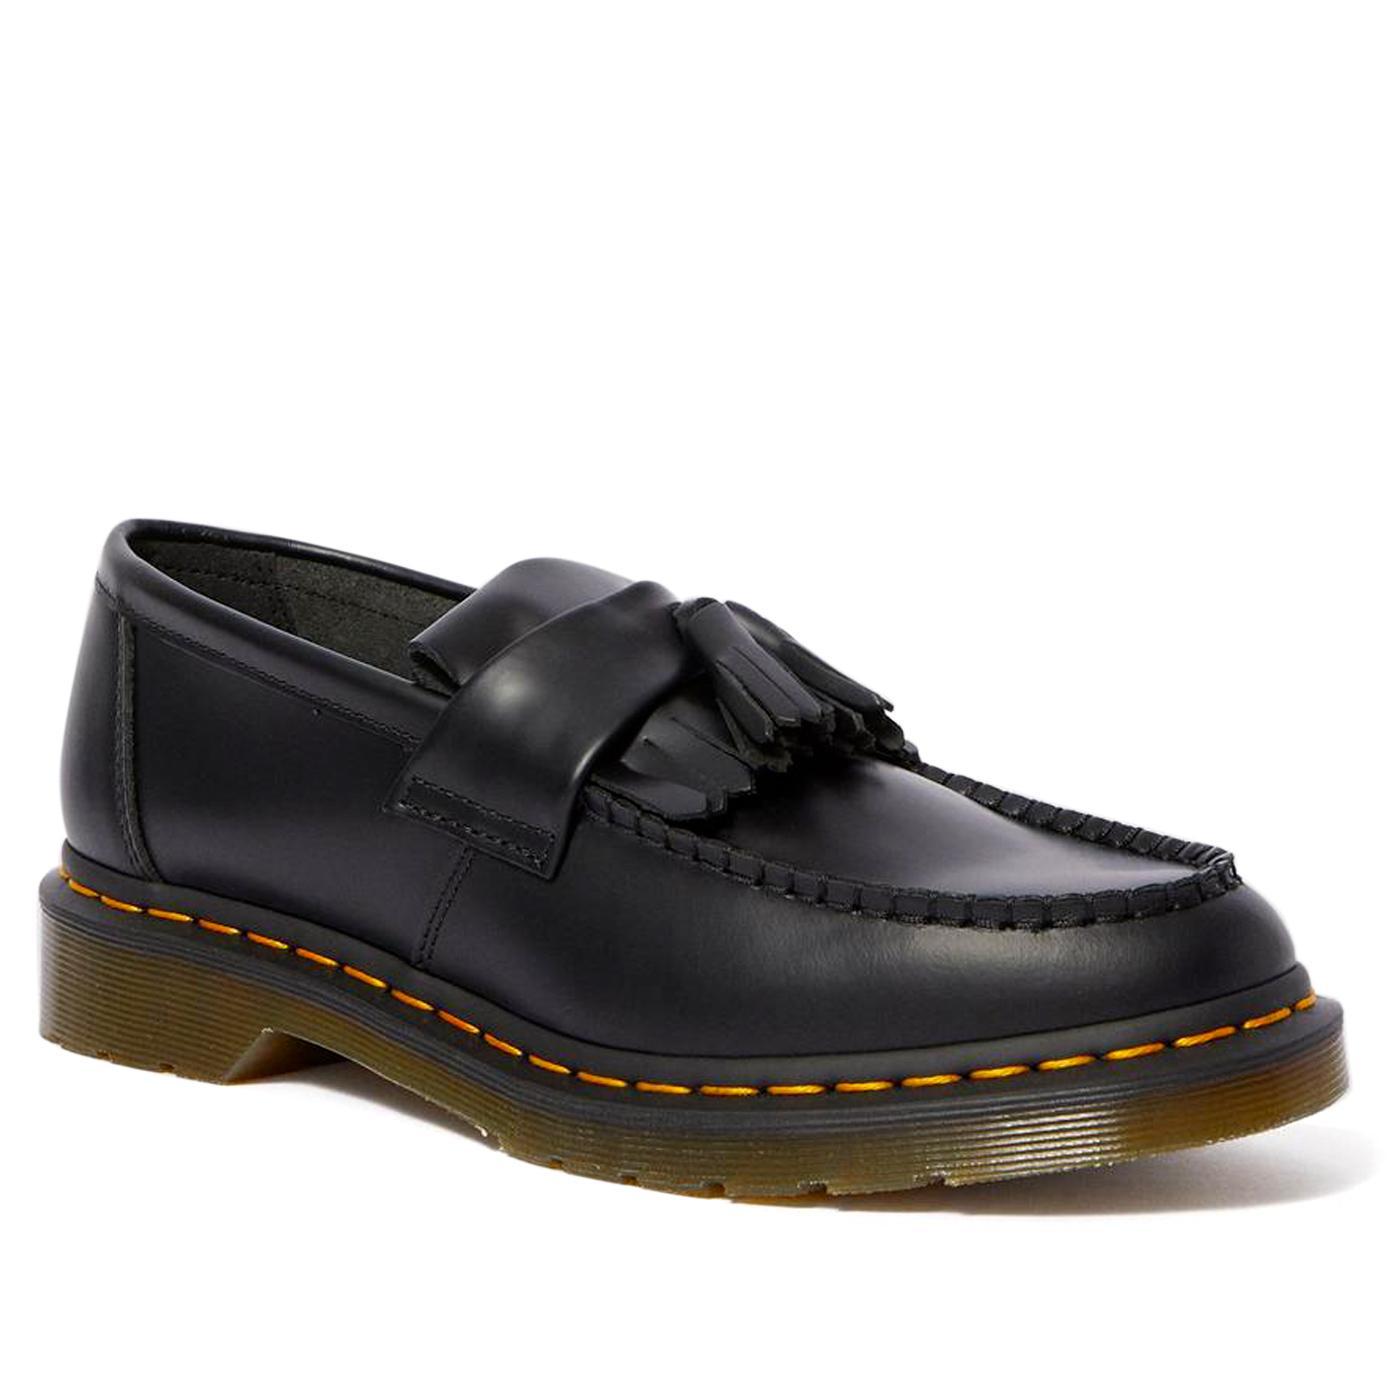 Adrian DR MARTENS Women's Leather Tassel Loafers